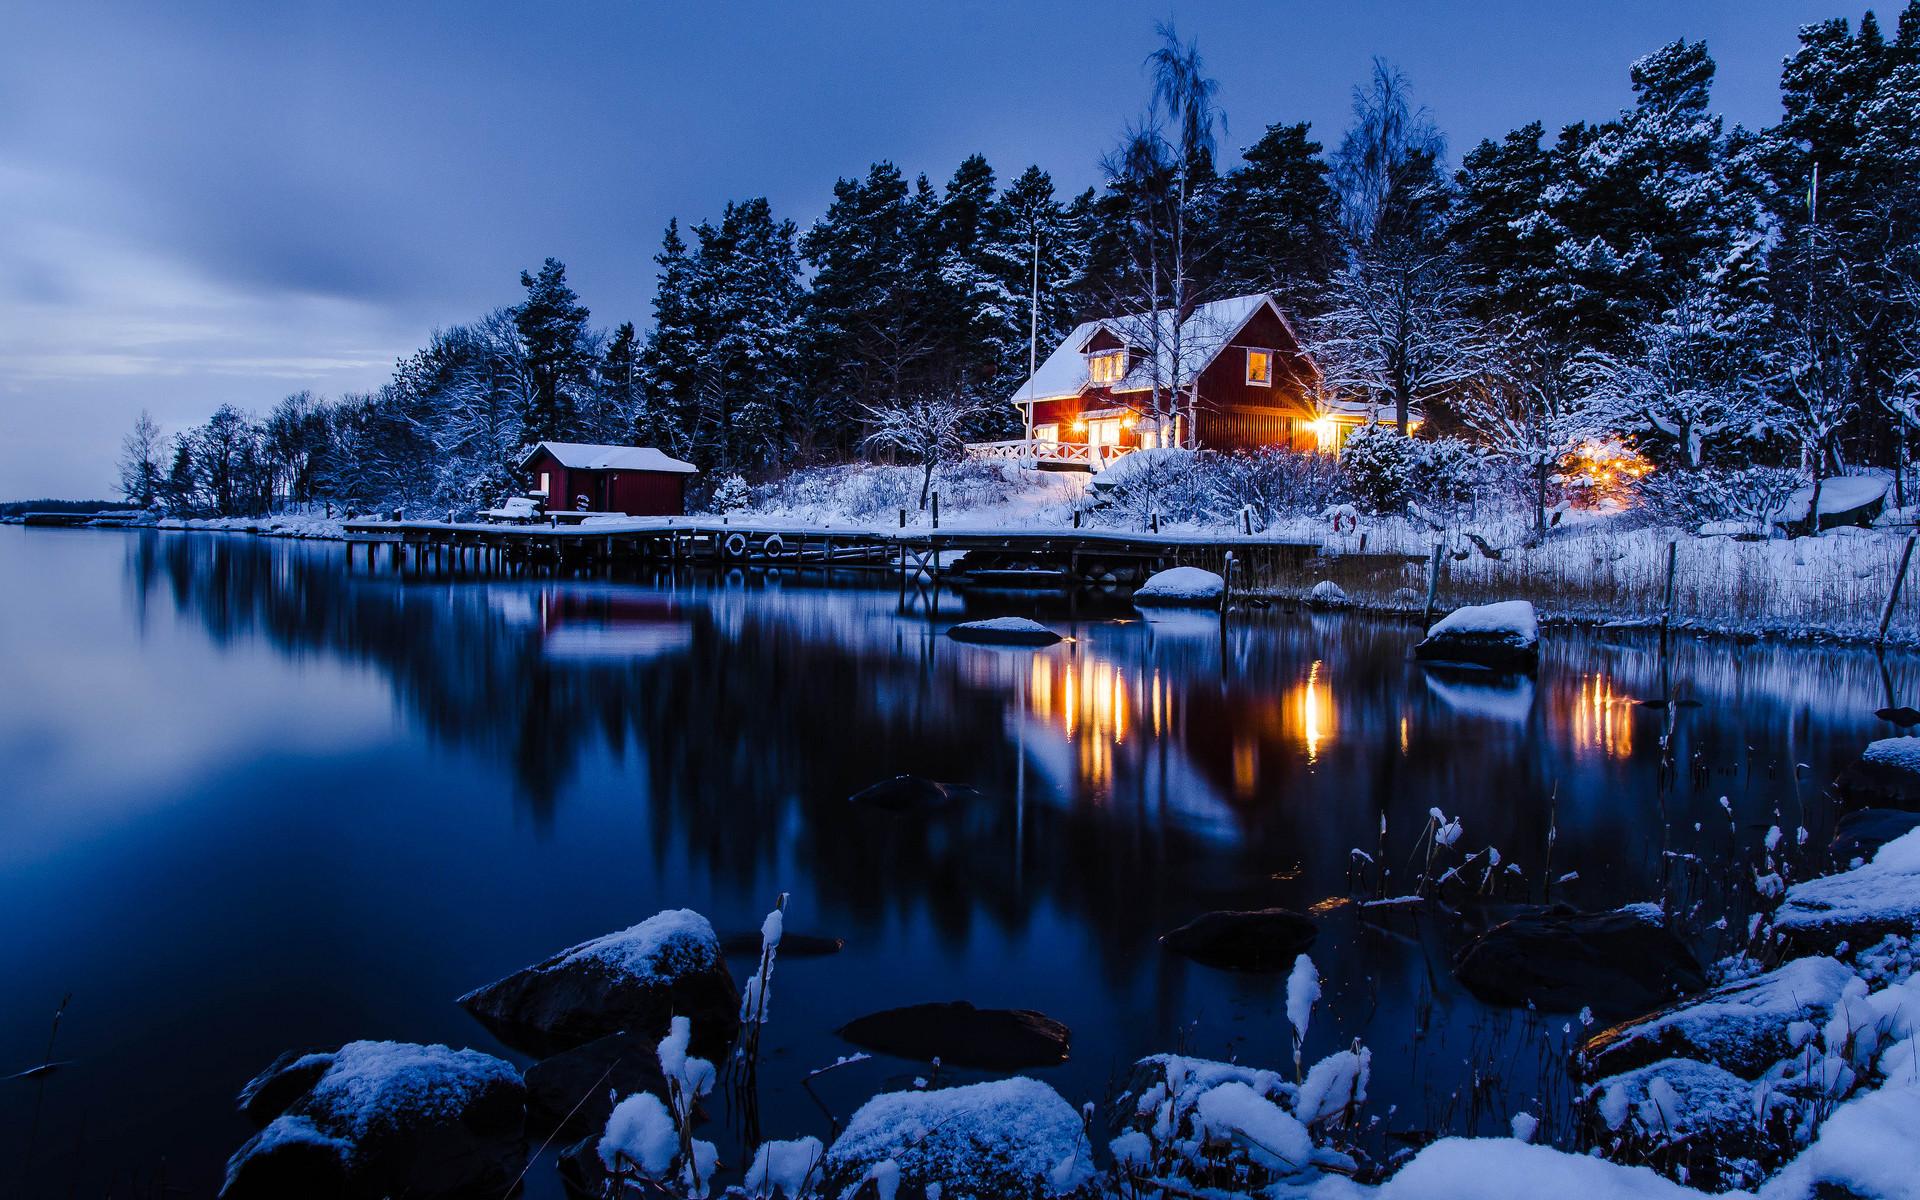 Beautiful Winter Night Wallpaper | Freetopwallpaper.com